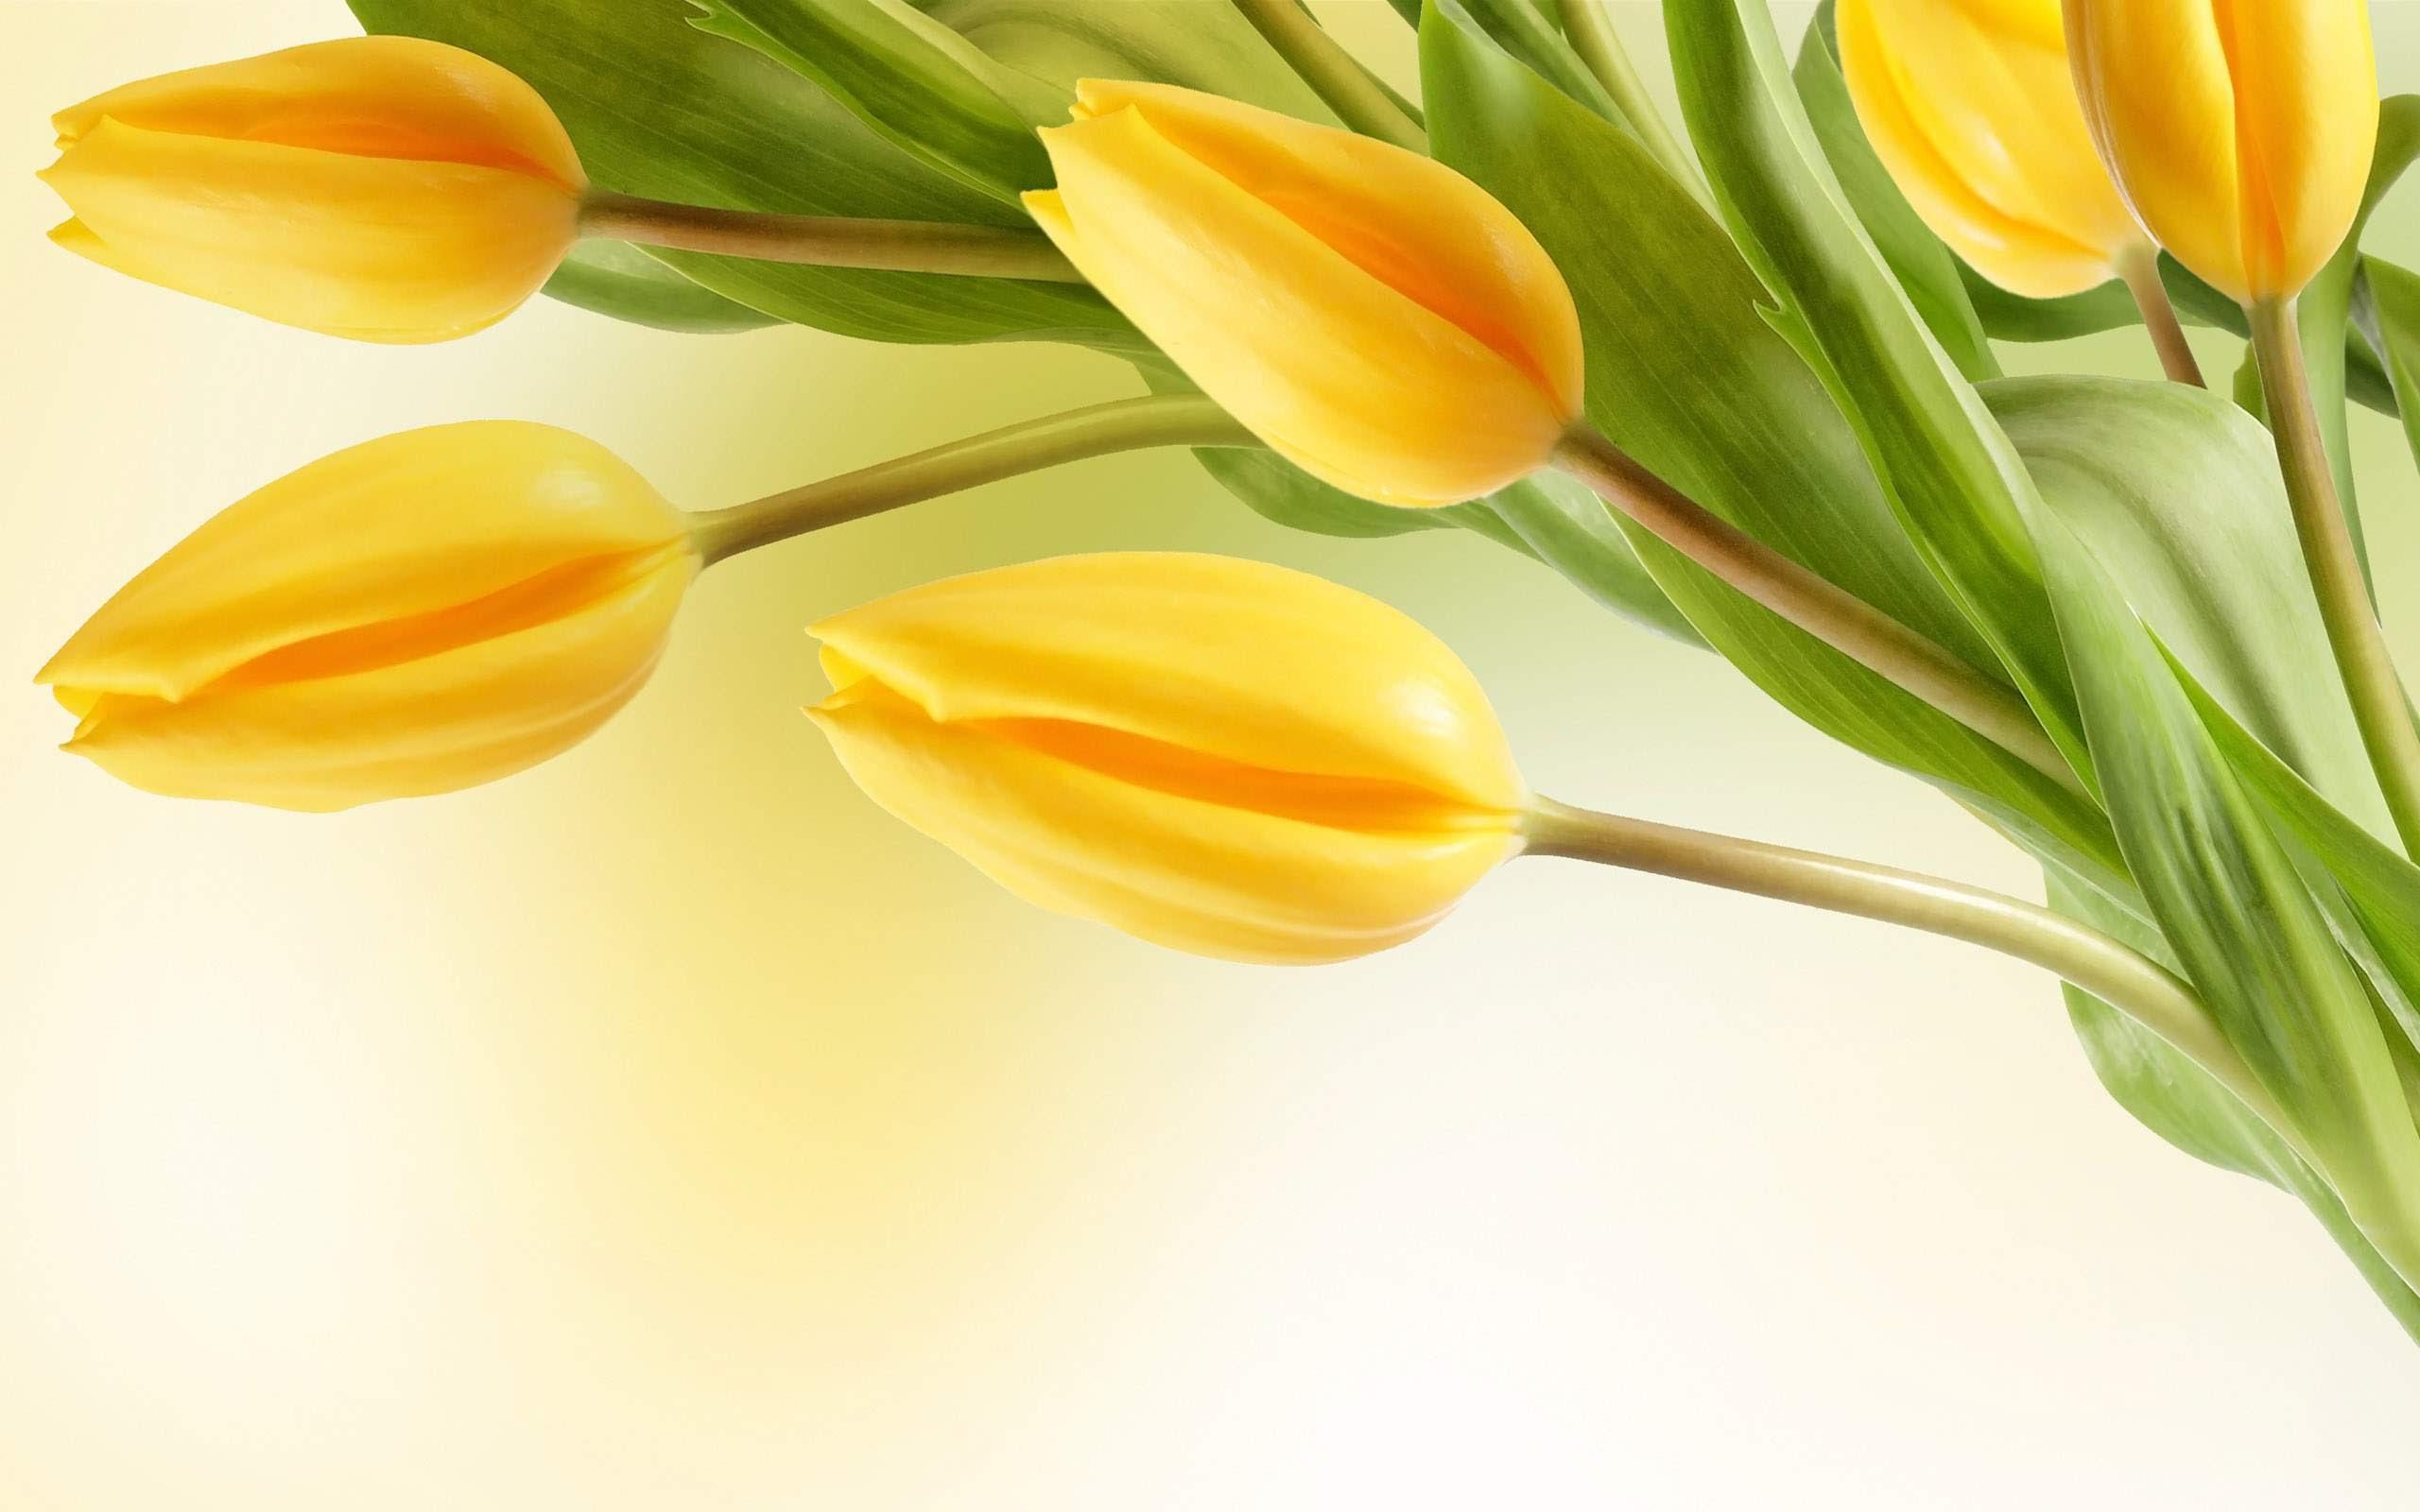 Tulip Flower Wallpaper Hd In Black Background Gambar Bunga